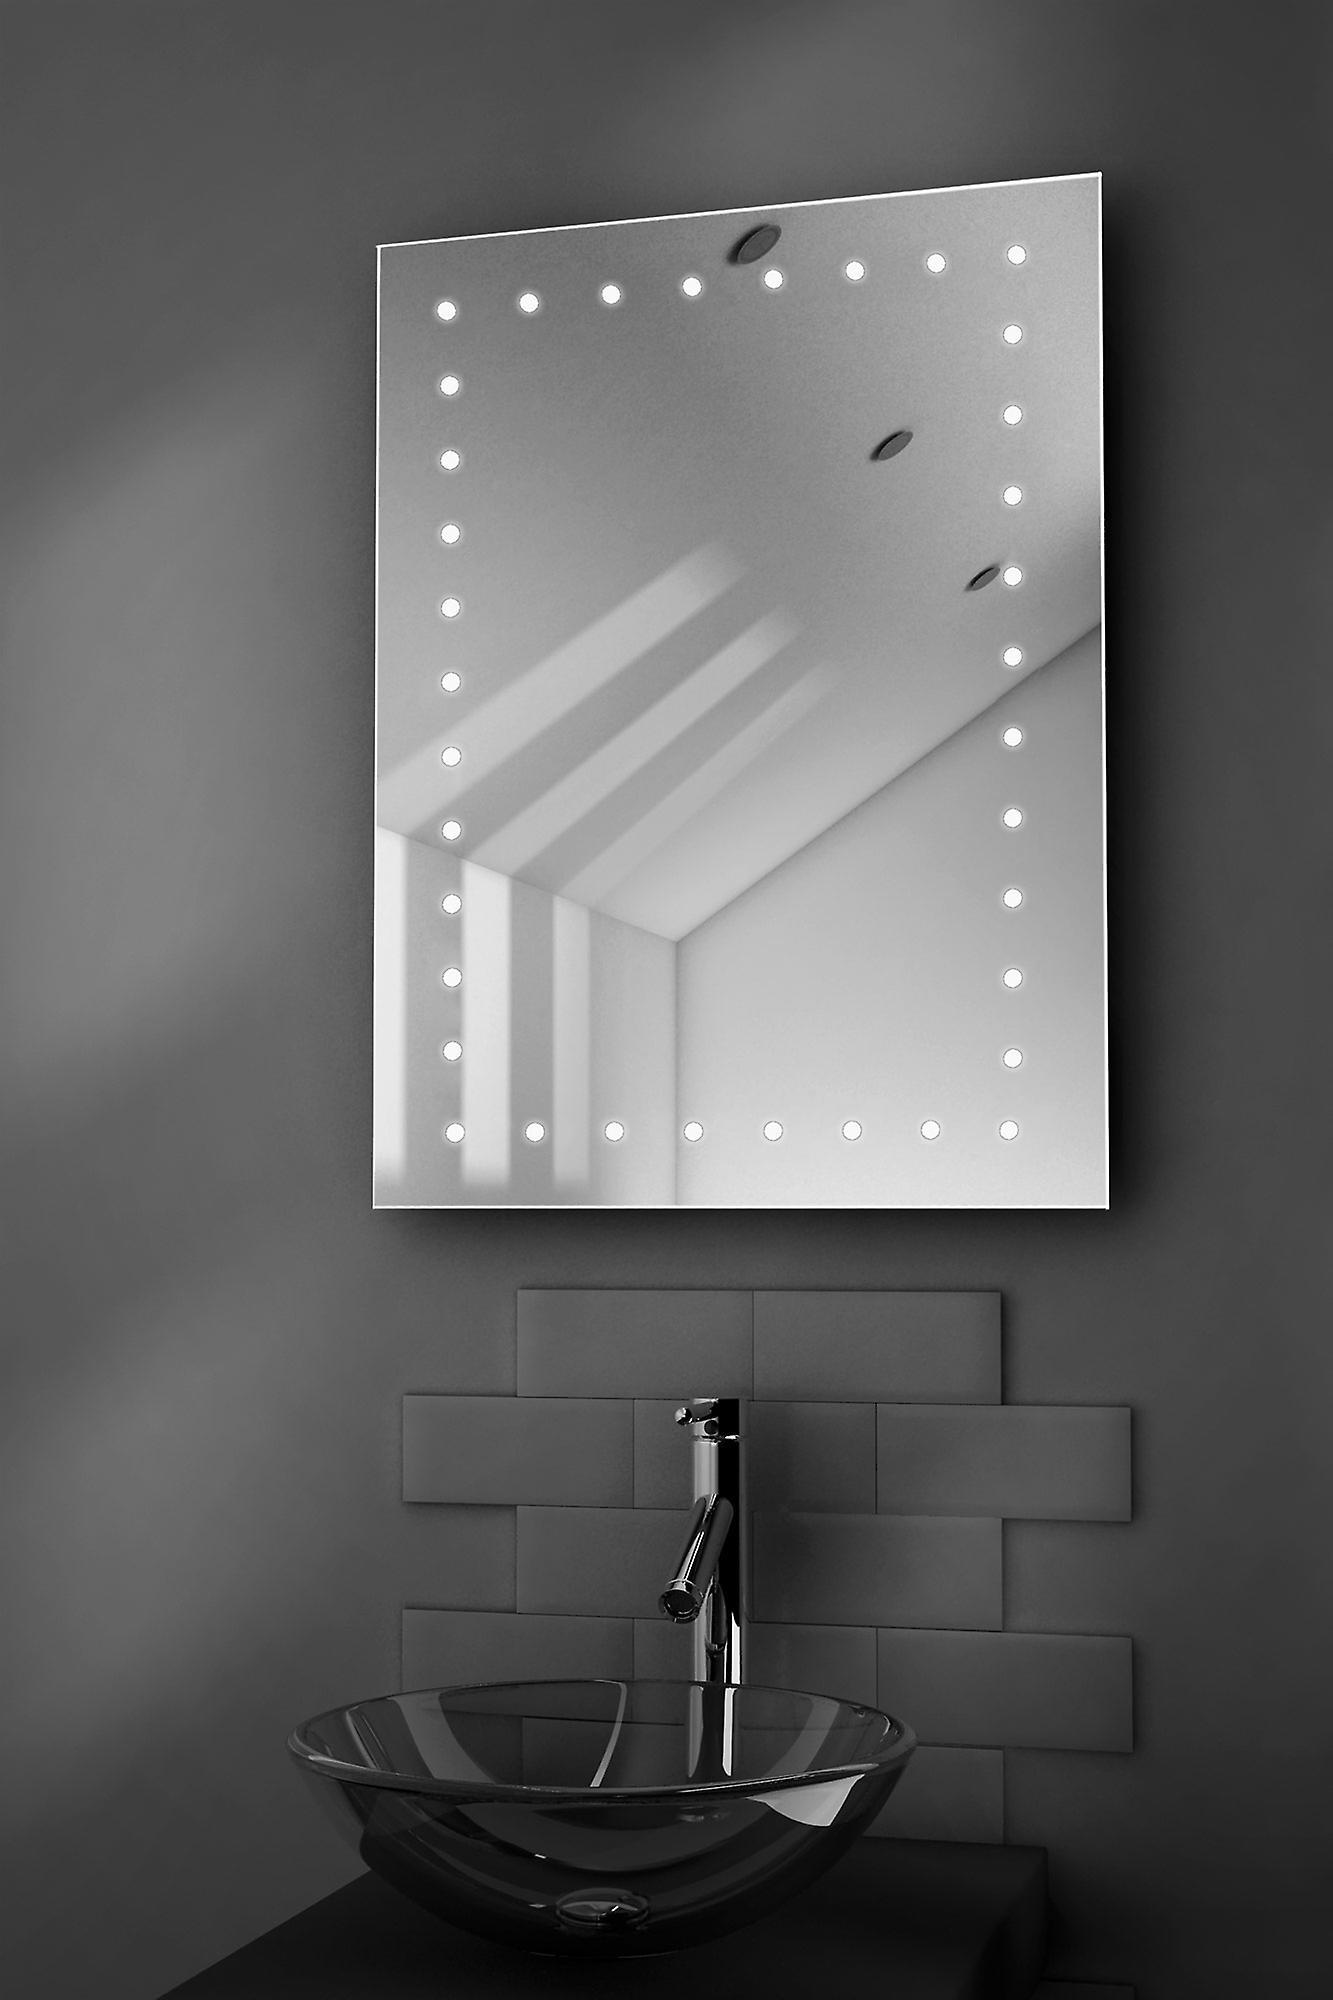 Inca Ultra-Slim LED Bathroom Mirror With Demister Pad & Sensor k166